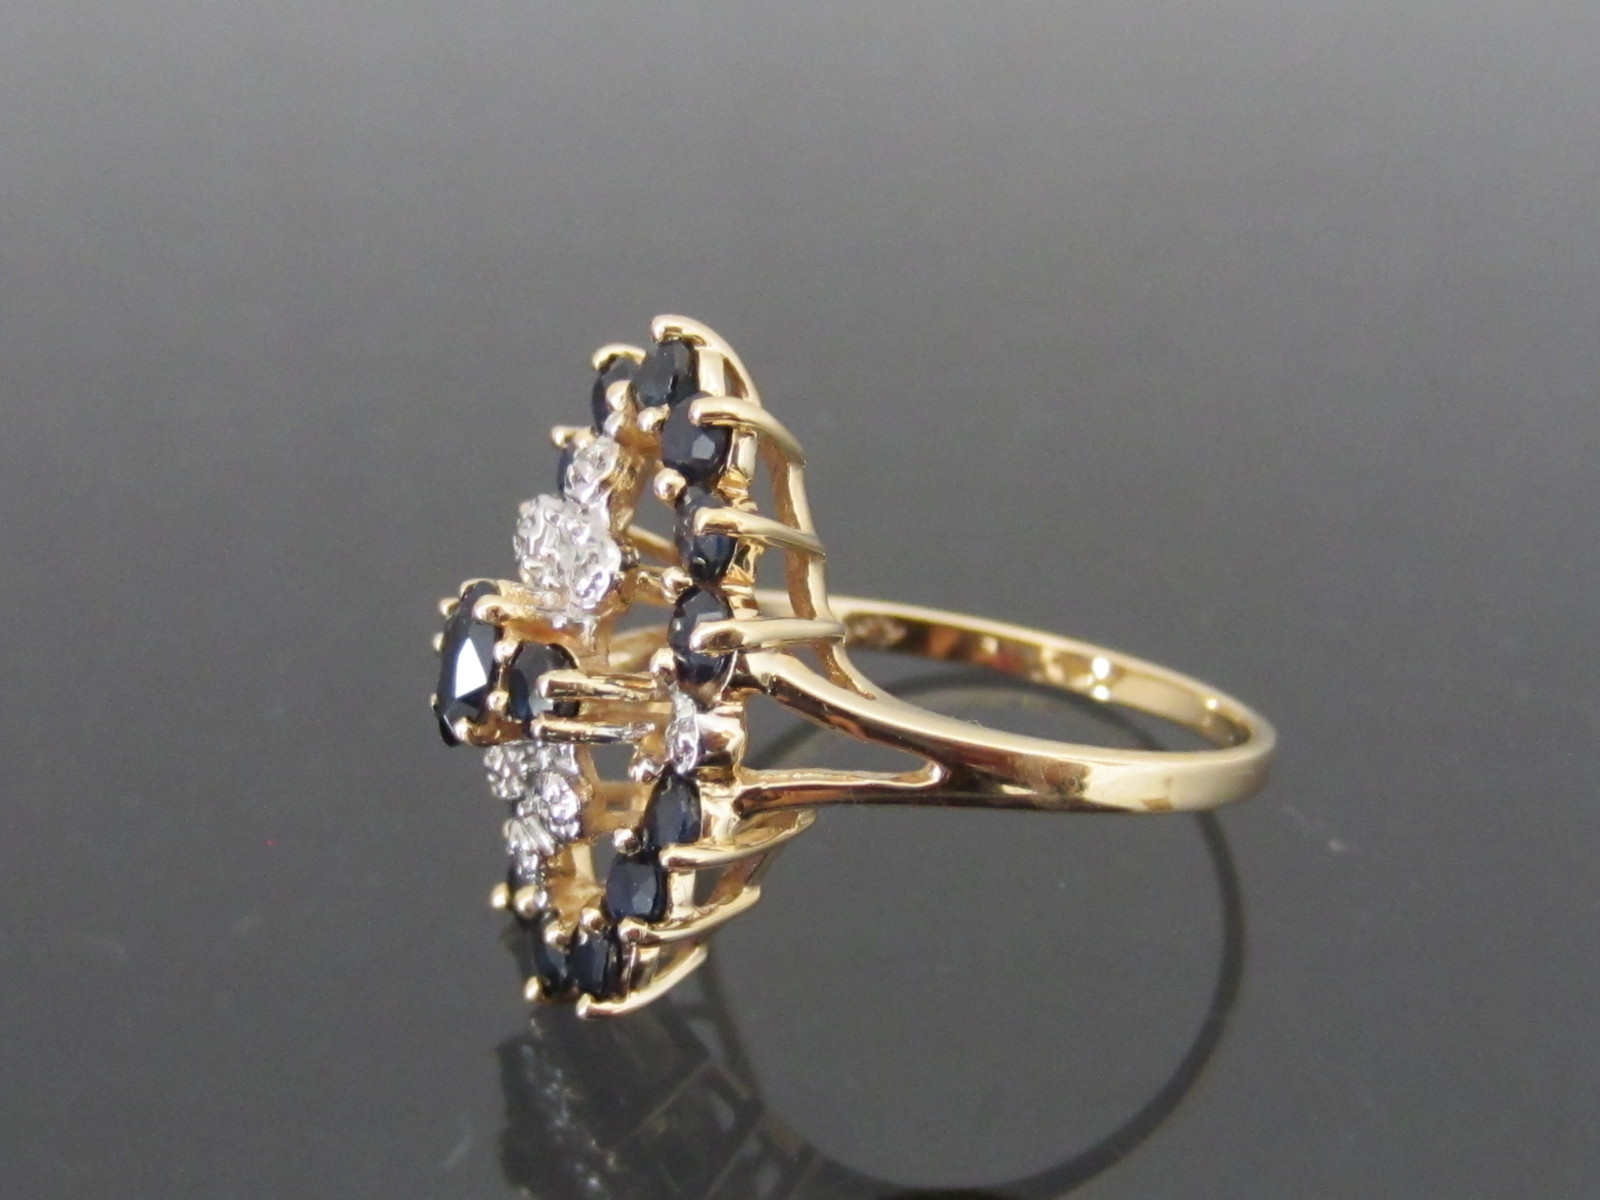 Vintage 14K Solid YG 1.11ct Genuine Ceylon Blue Sapphire & Diamond Ring Size 8.2